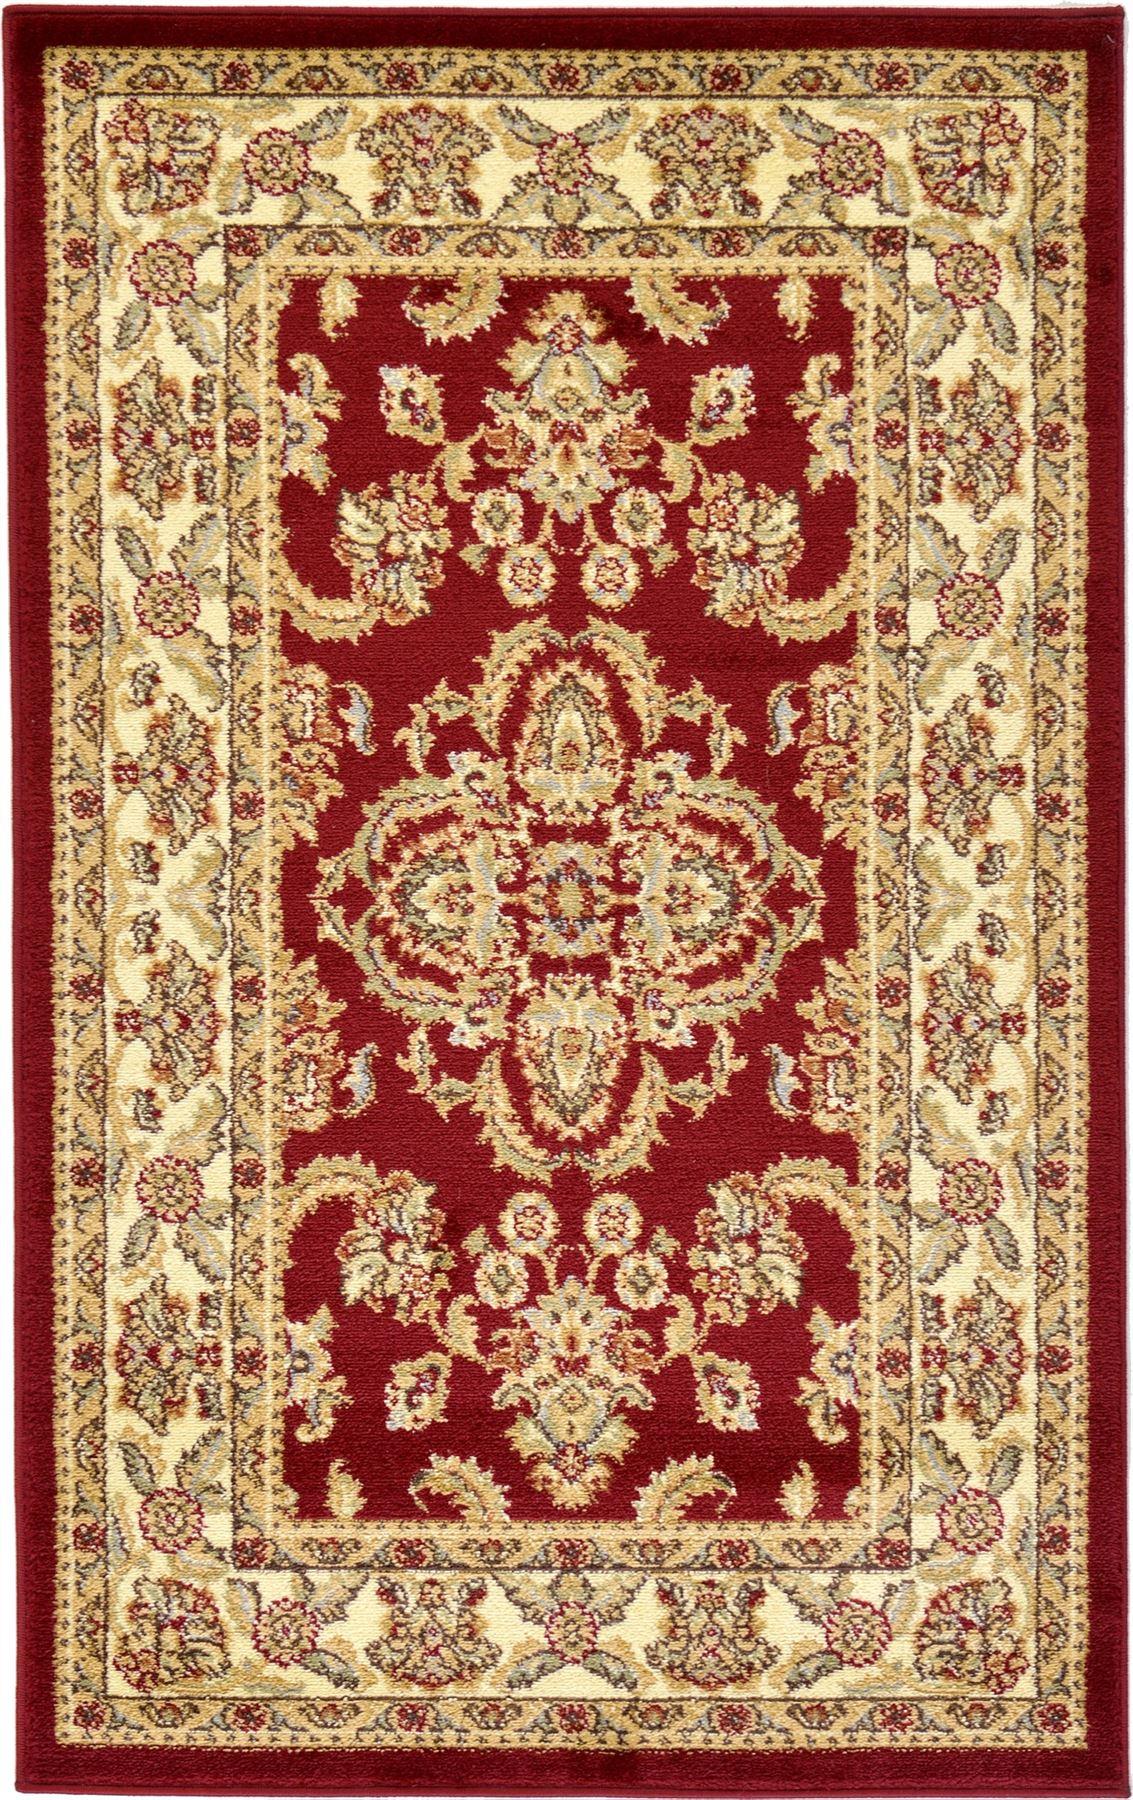 Nursery rug red : ... medallion persian area rug oriental bordered classic red rugs  ebay